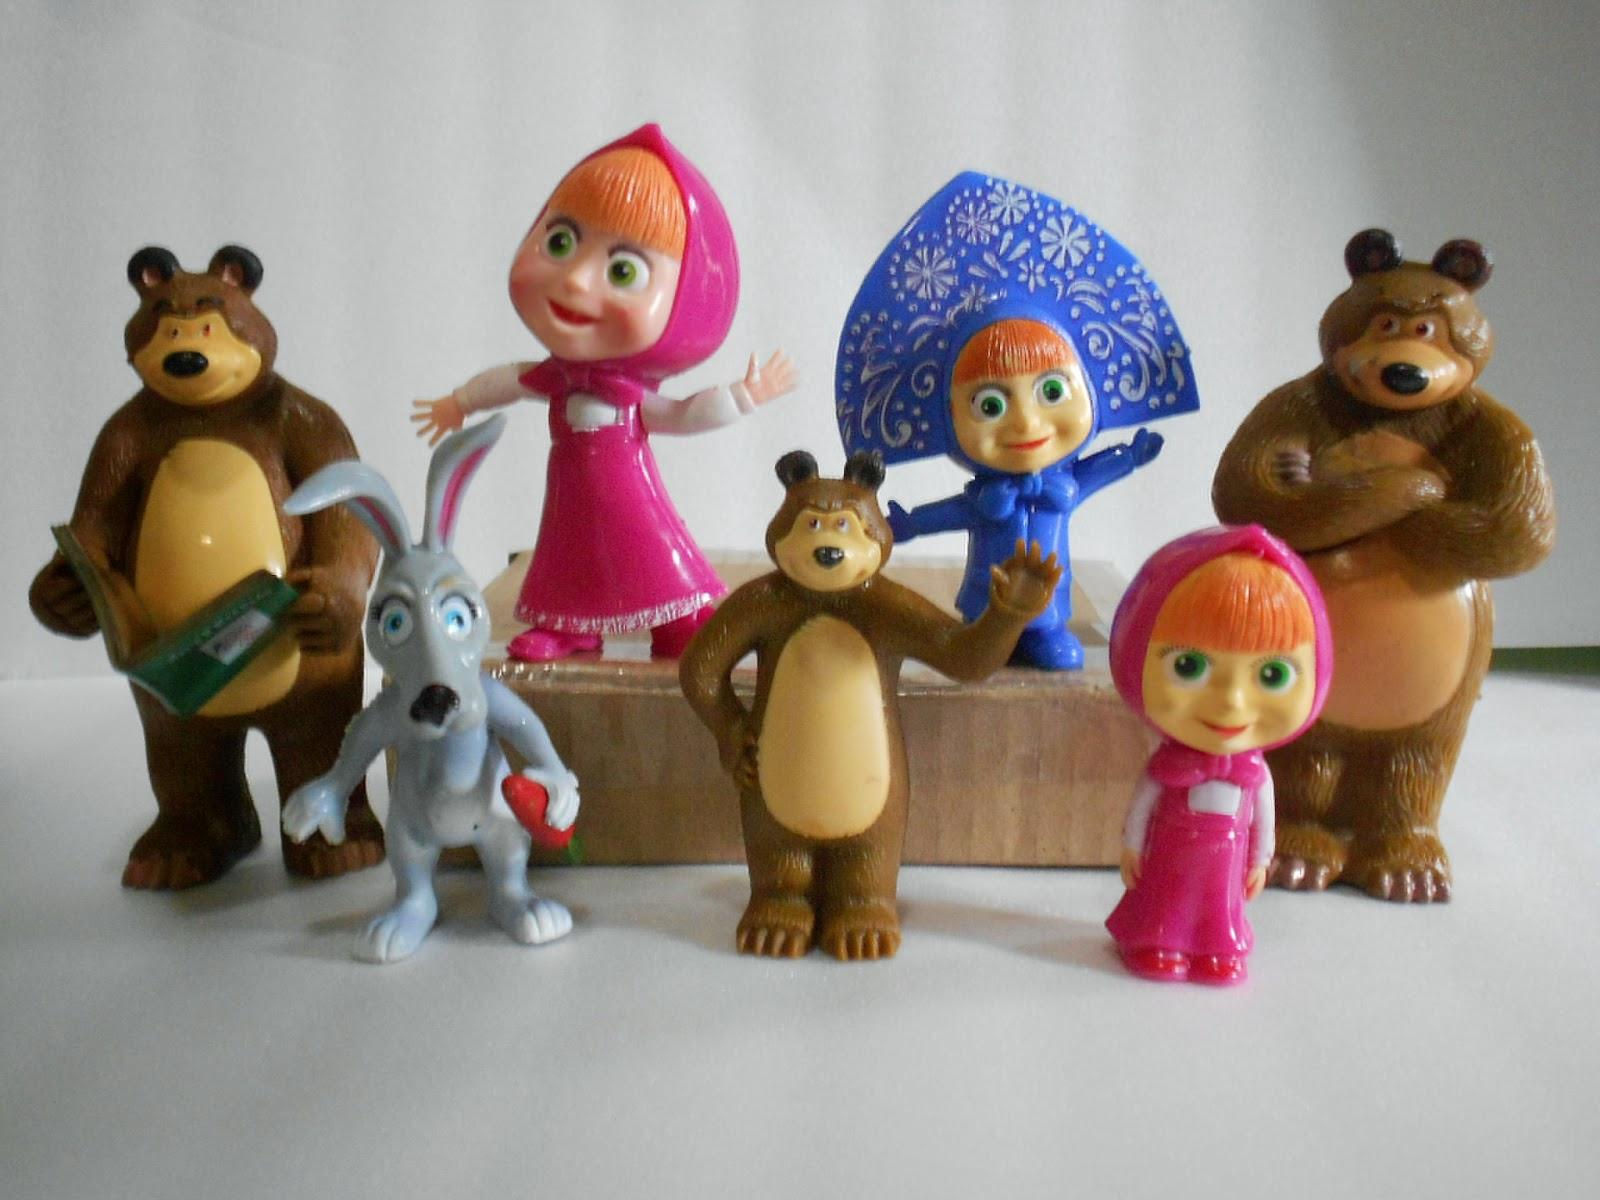 Grosiran Hiasan Kue Ulang Tahun Princess Masha N The Bear